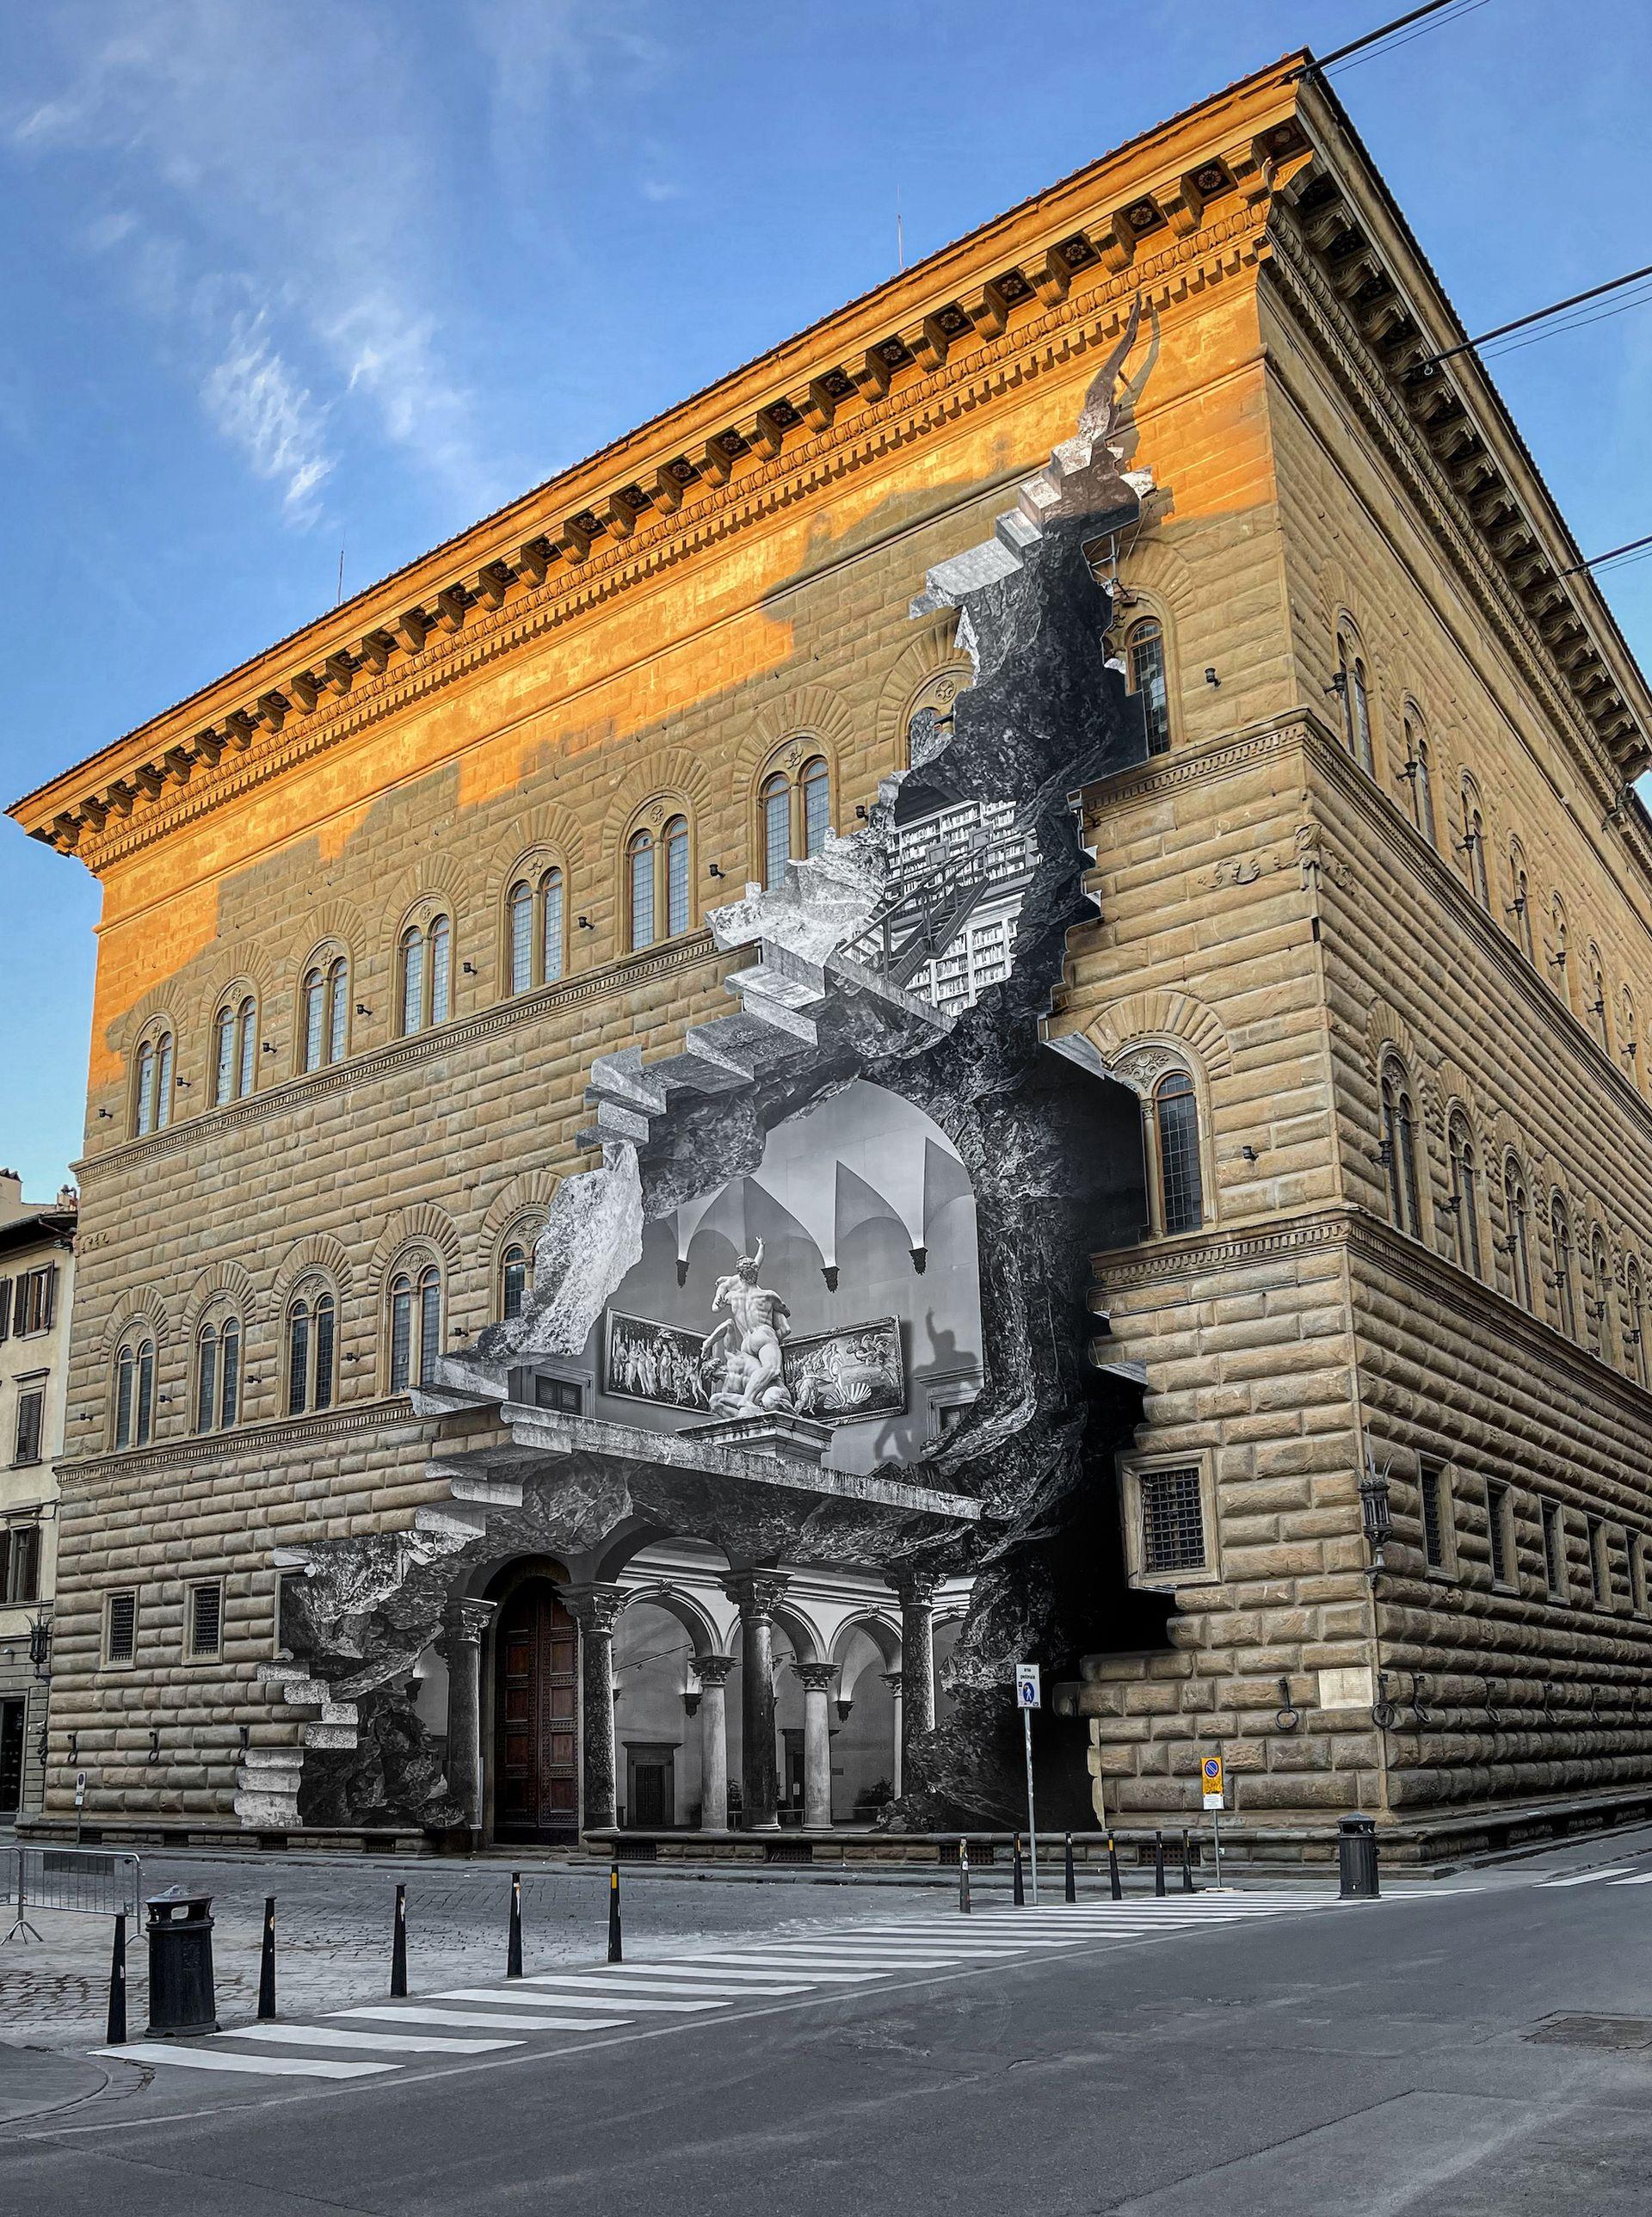 JR's La Ferita (the wound) at the Palazzo Strozzi in Florence Photo: JR